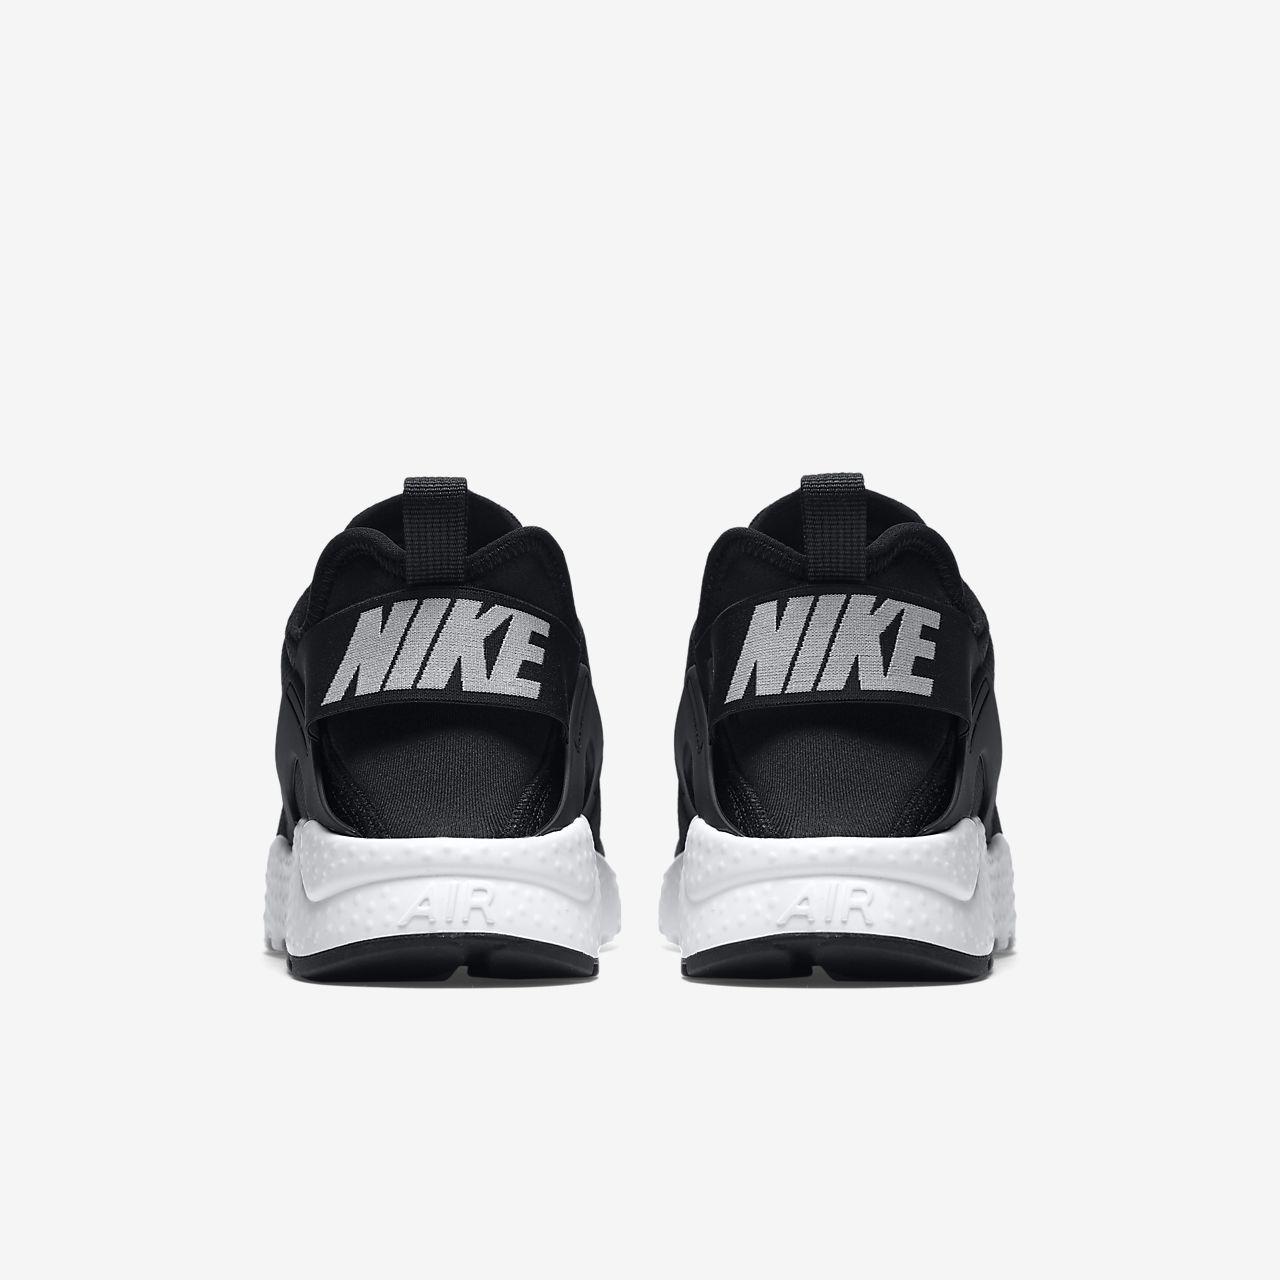 Ultra Huarache Pour Femme Chaussure Nike Air JcFKl1T